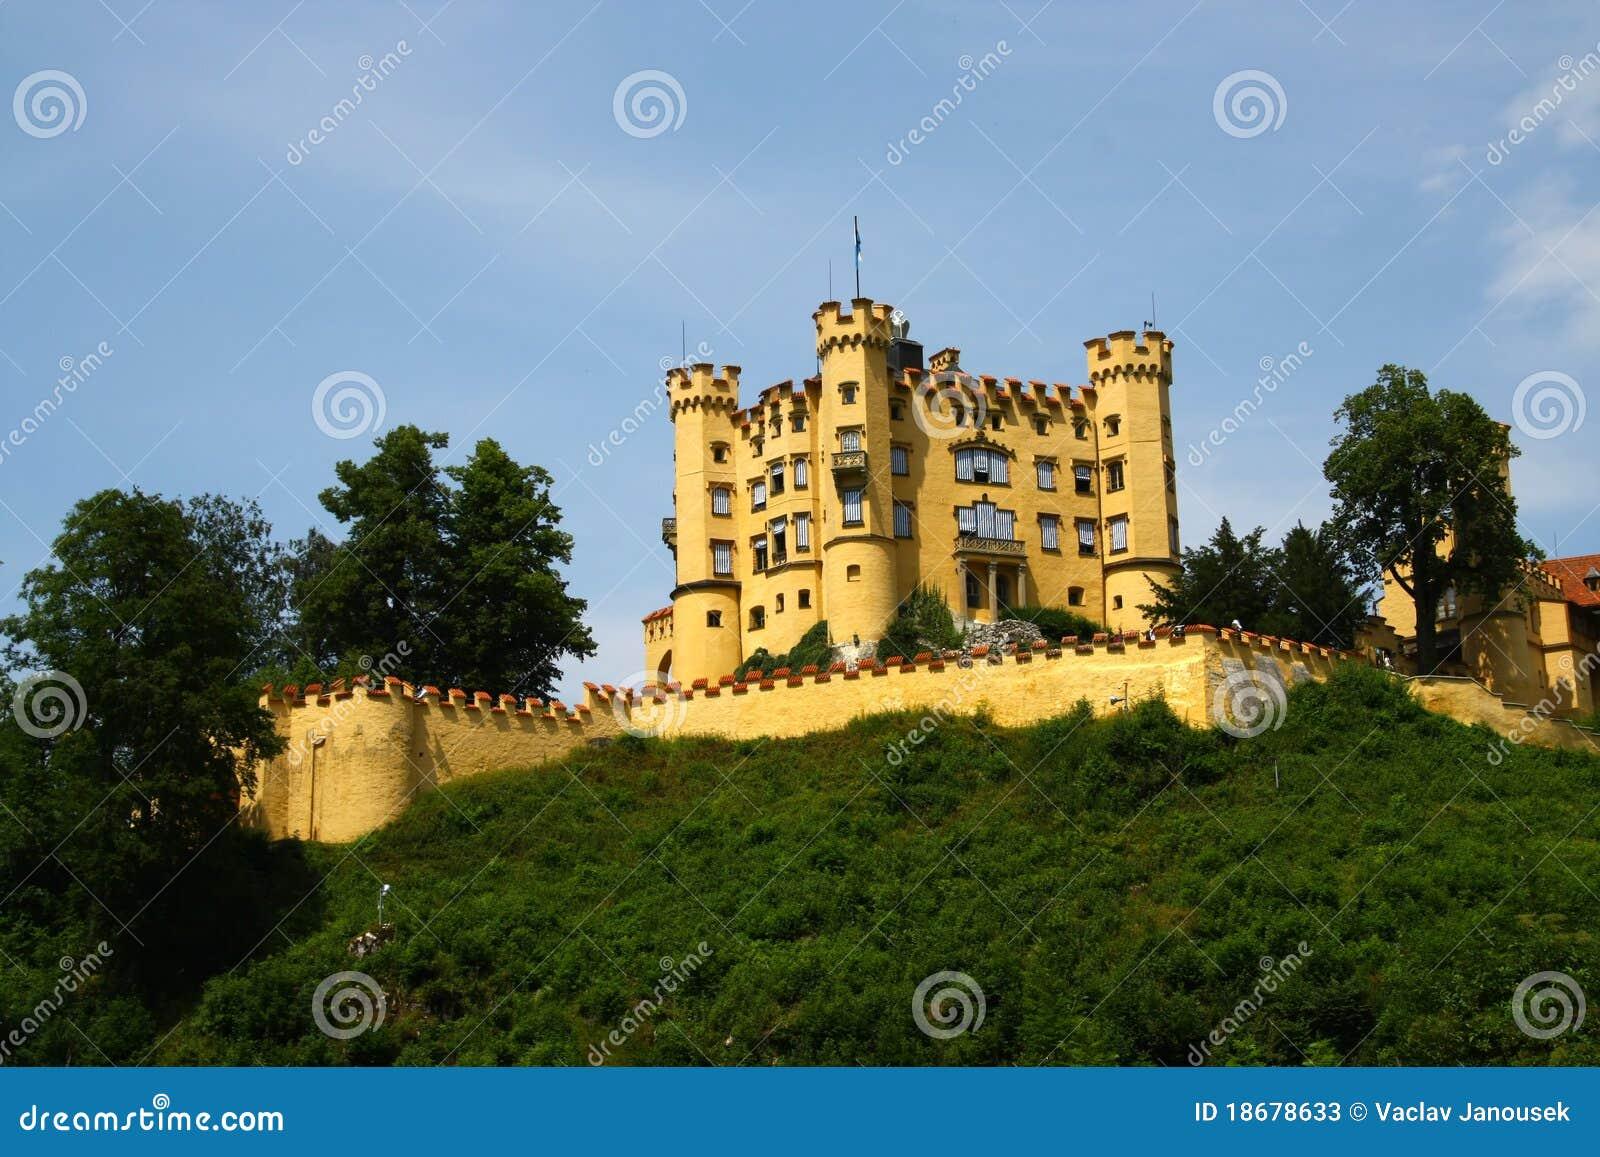 Slottet hohen schwangau